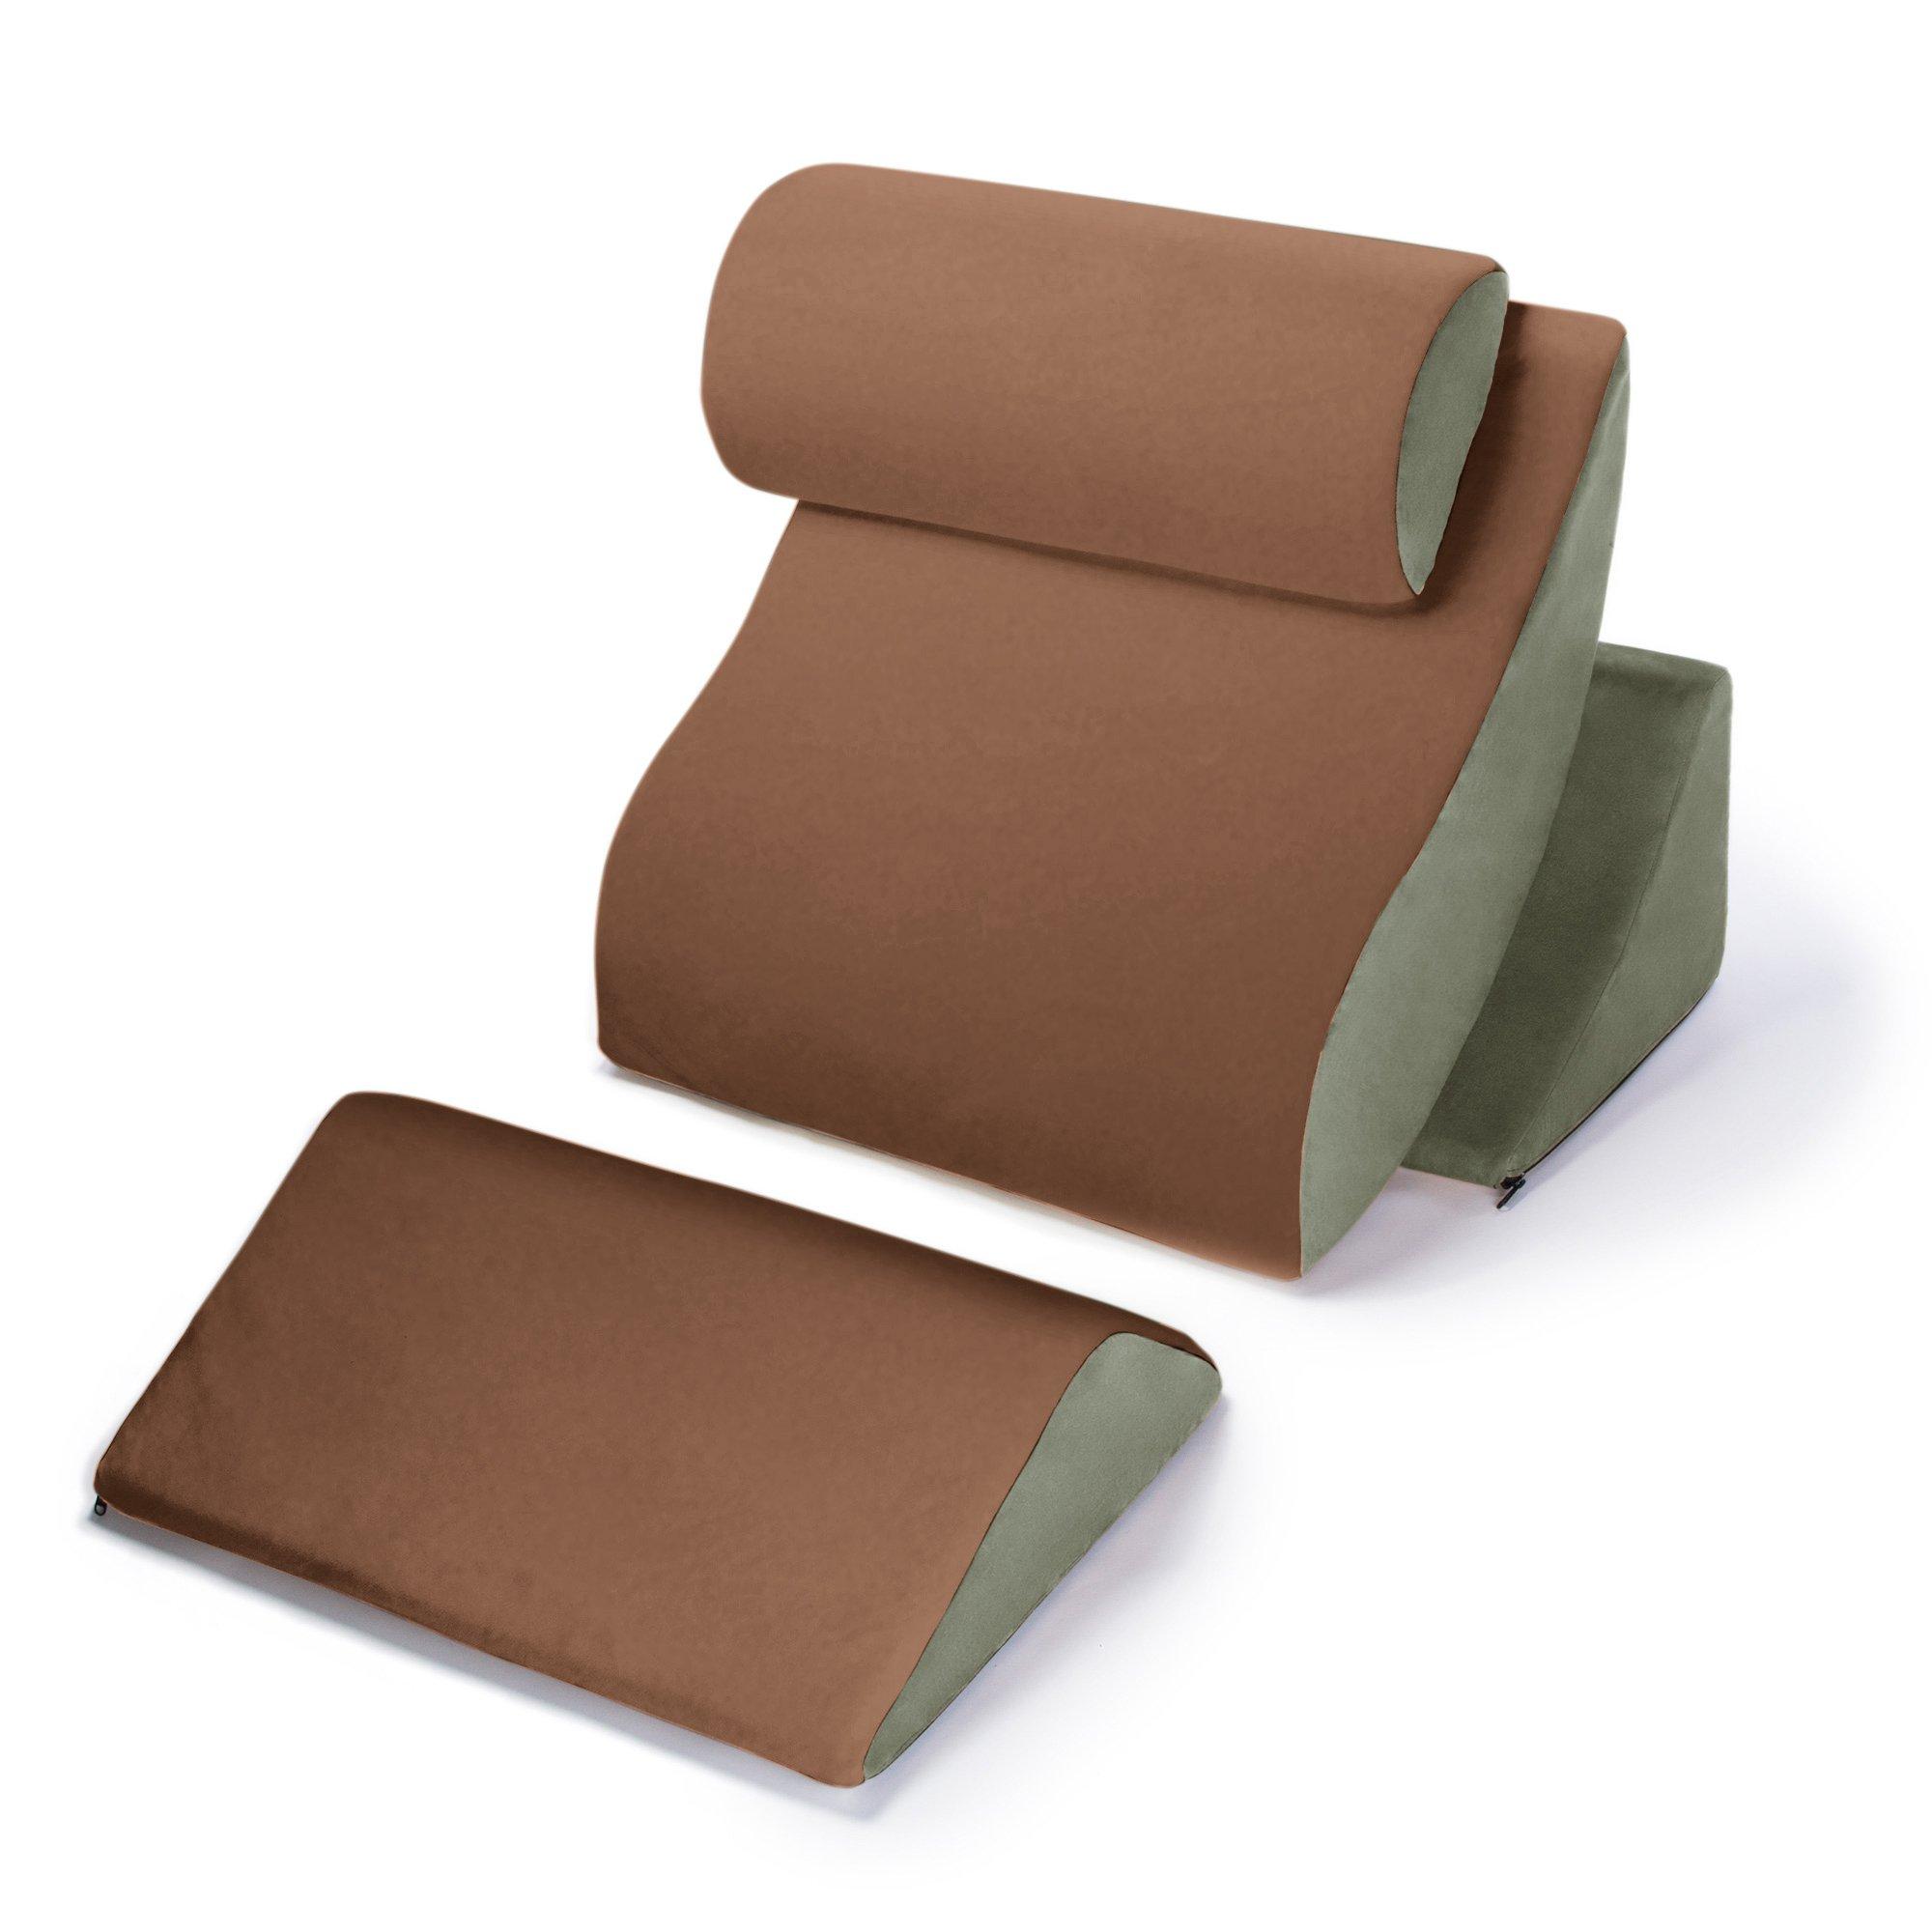 Avana Kind Bed Orthopedic Support Pillow Comfort System, Brown Sugar/Sage